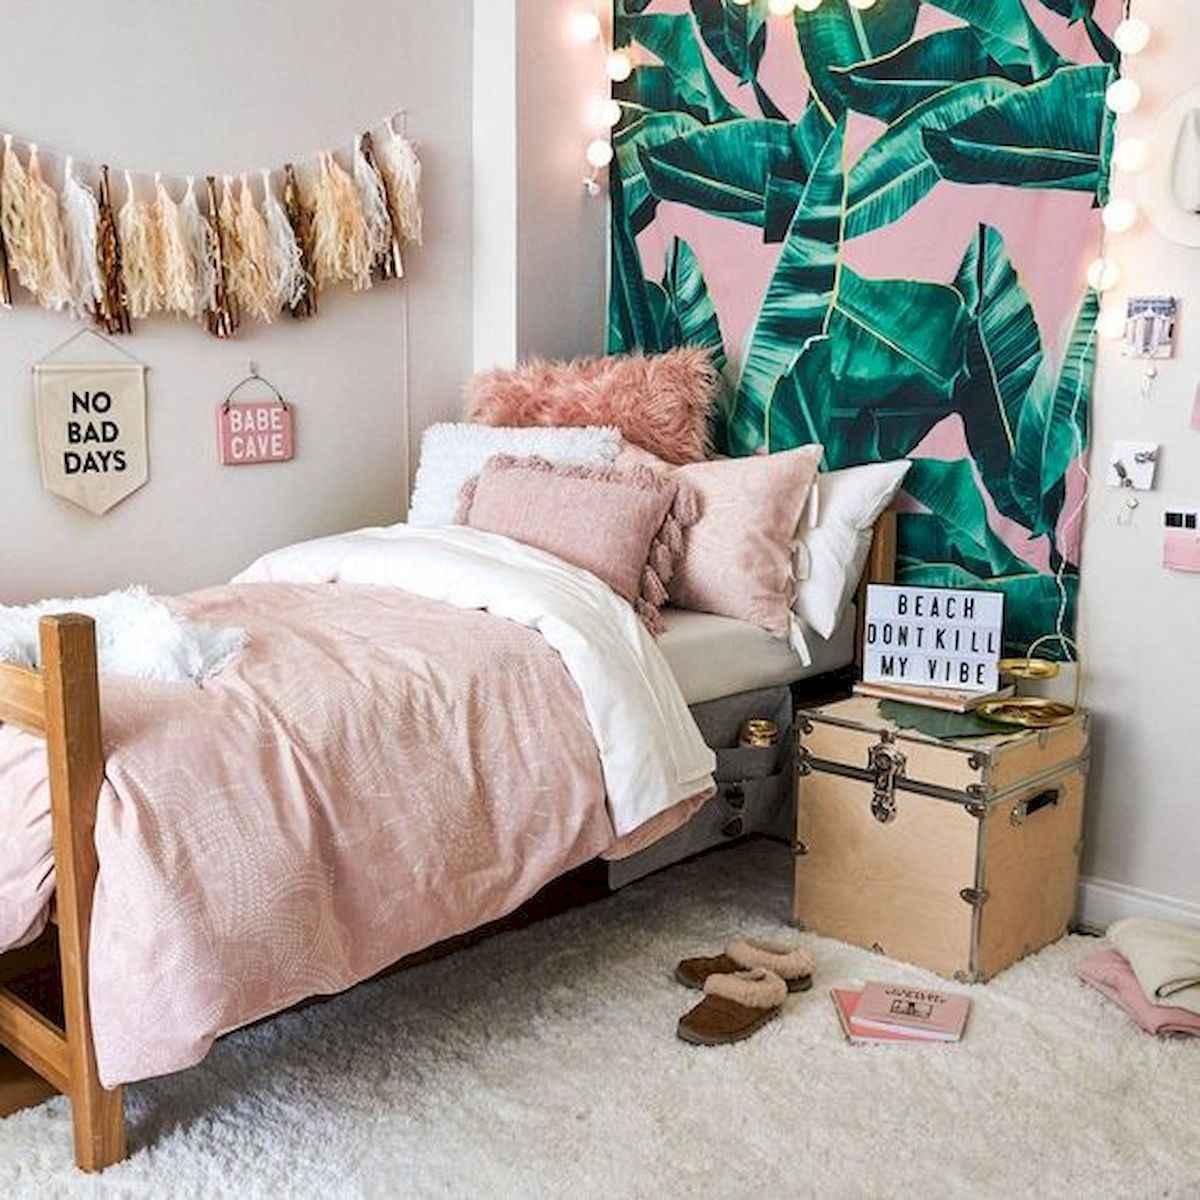 80 Fantastic Small Apartment Bedroom College Design Ideas and Decor (48)